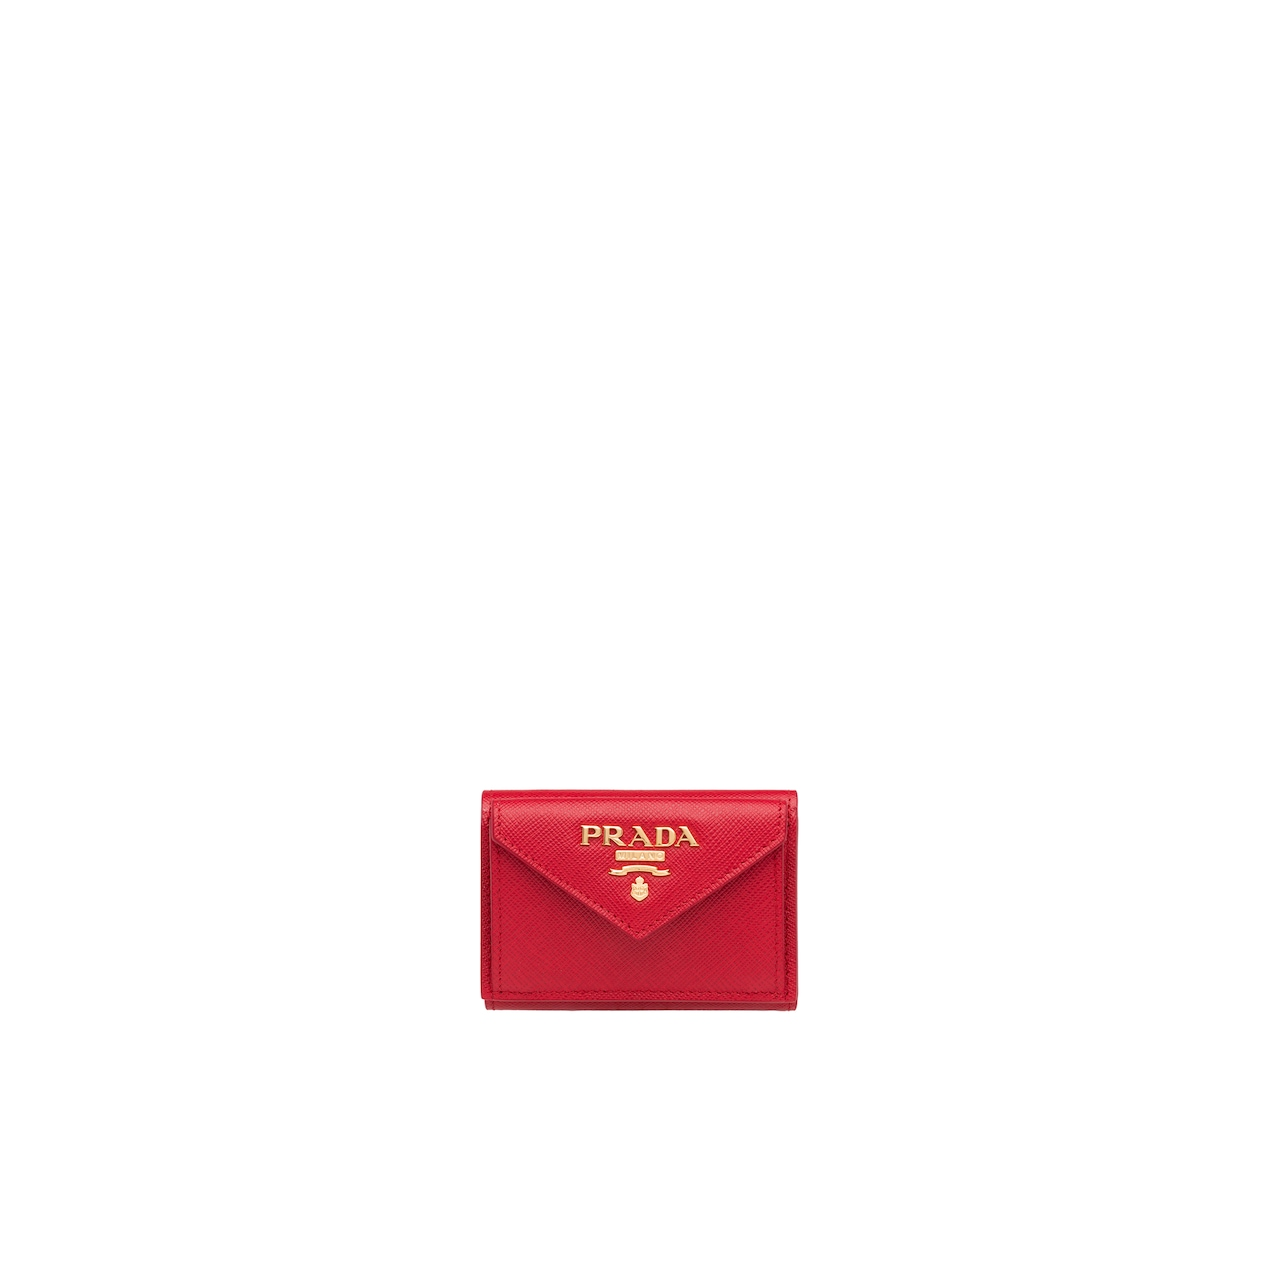 Prada Small Saffiano leather wallet 1